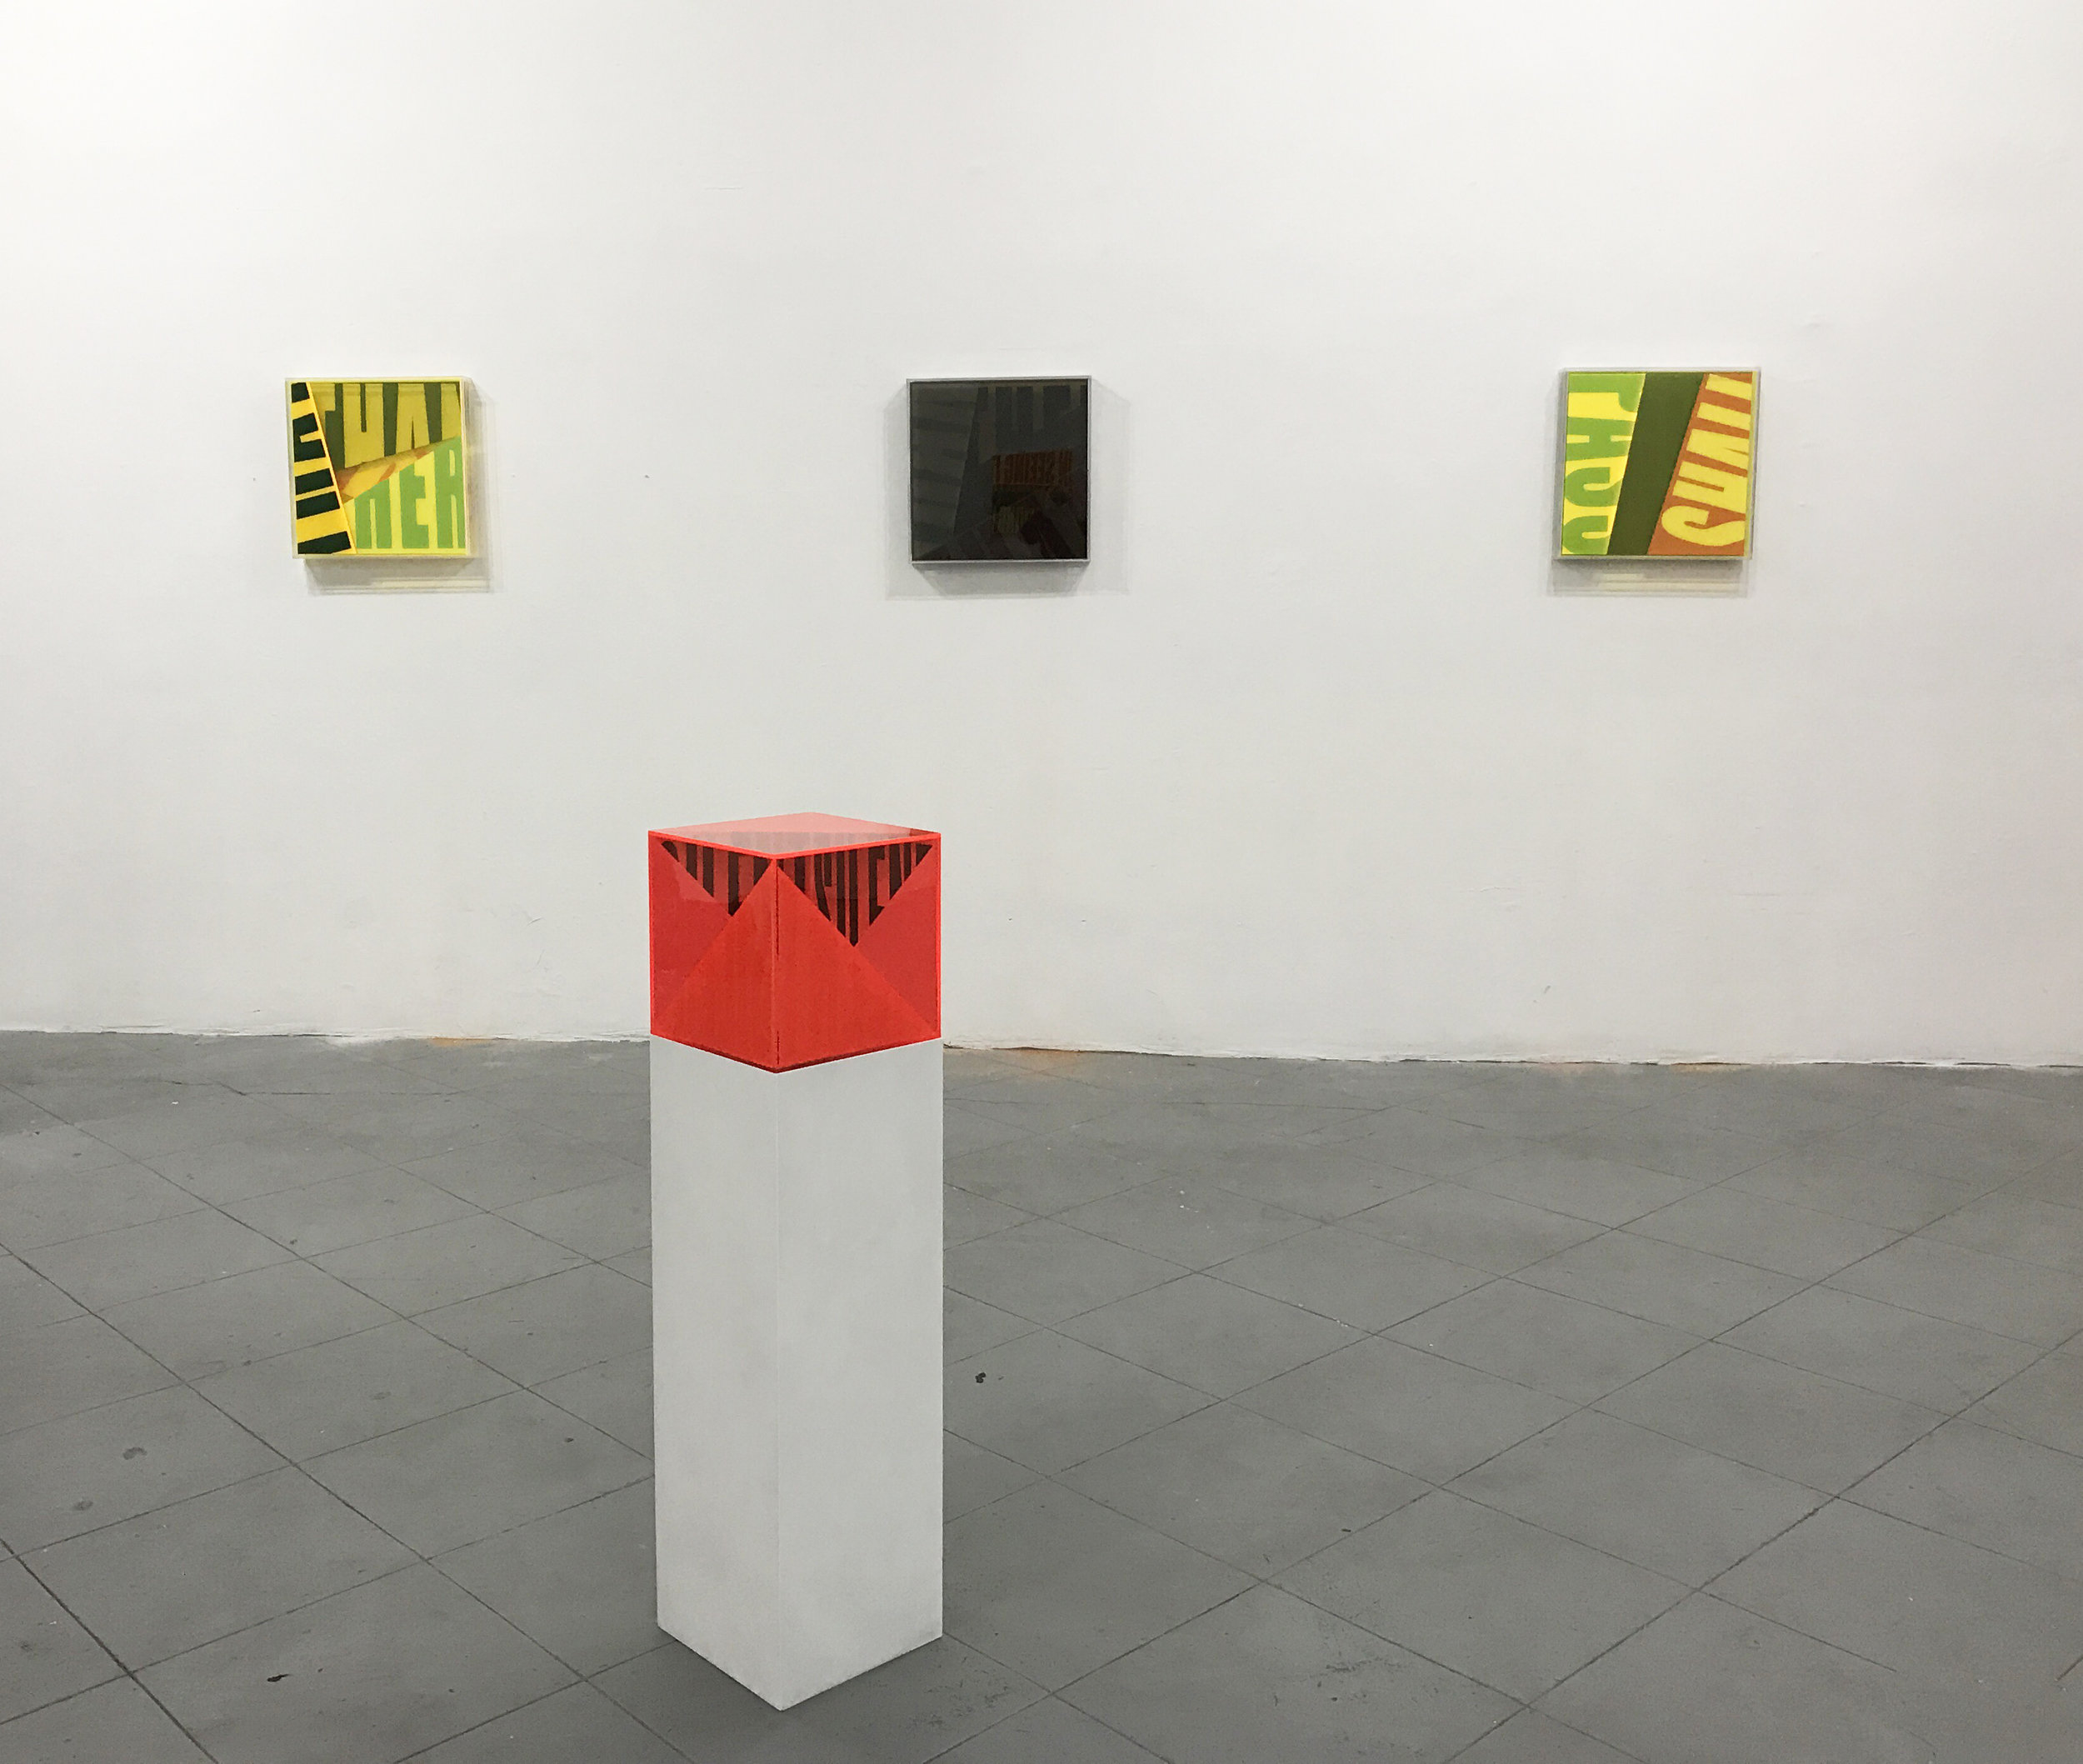 Semantics installation view - acrylic sculptures